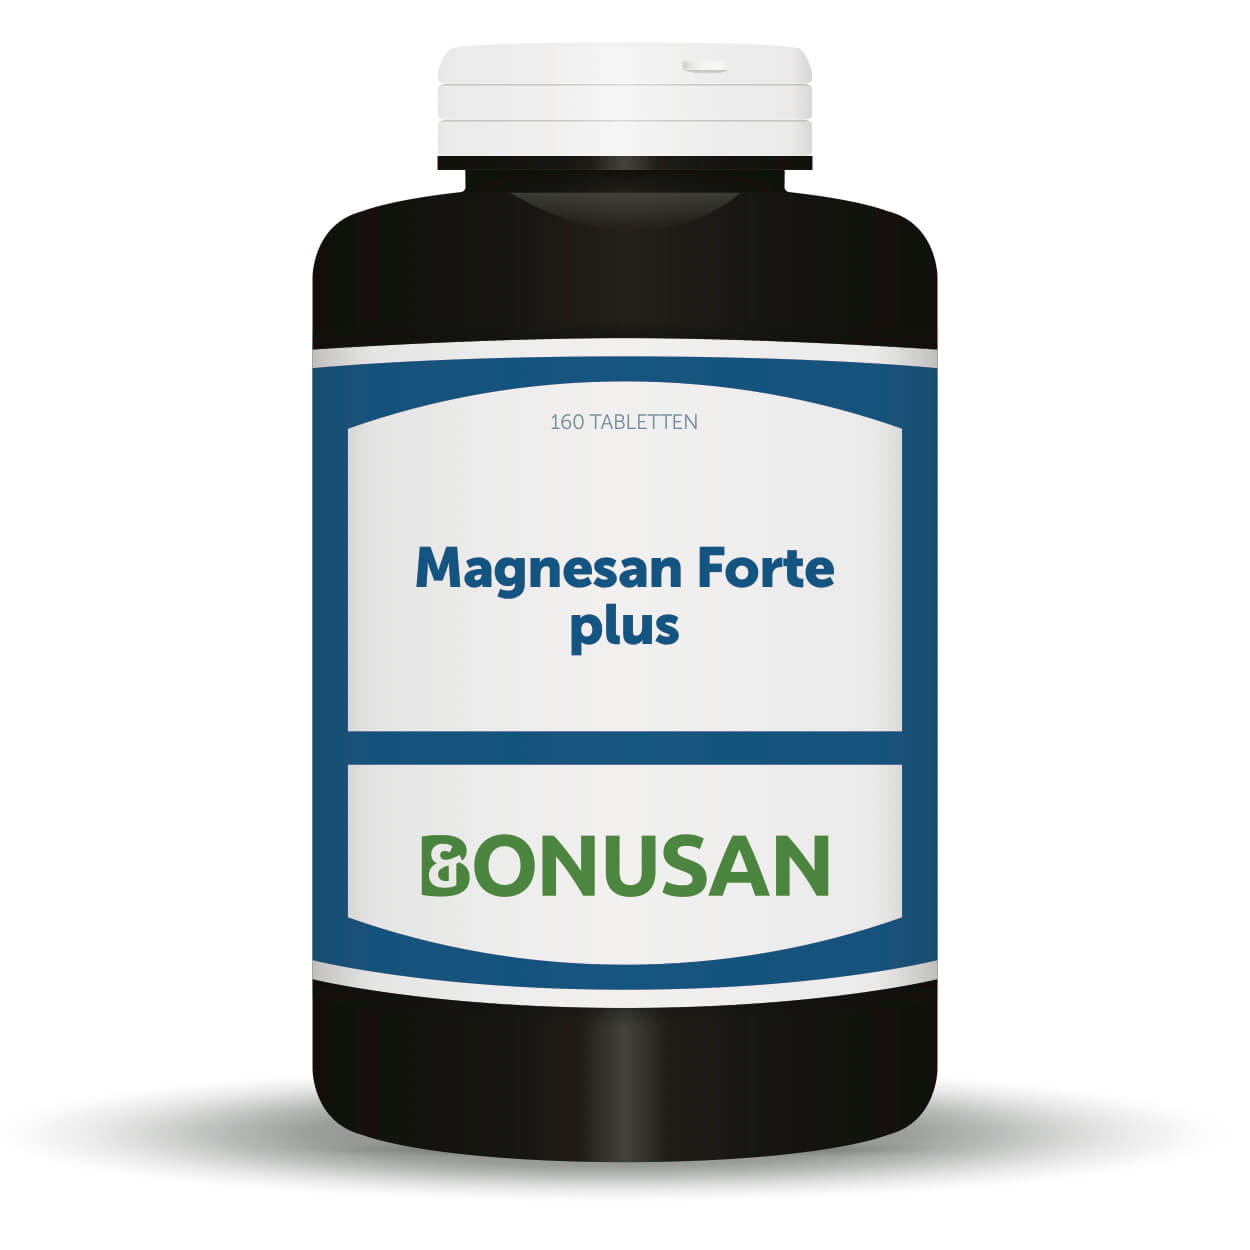 Magnesan Forte plus Großpackung